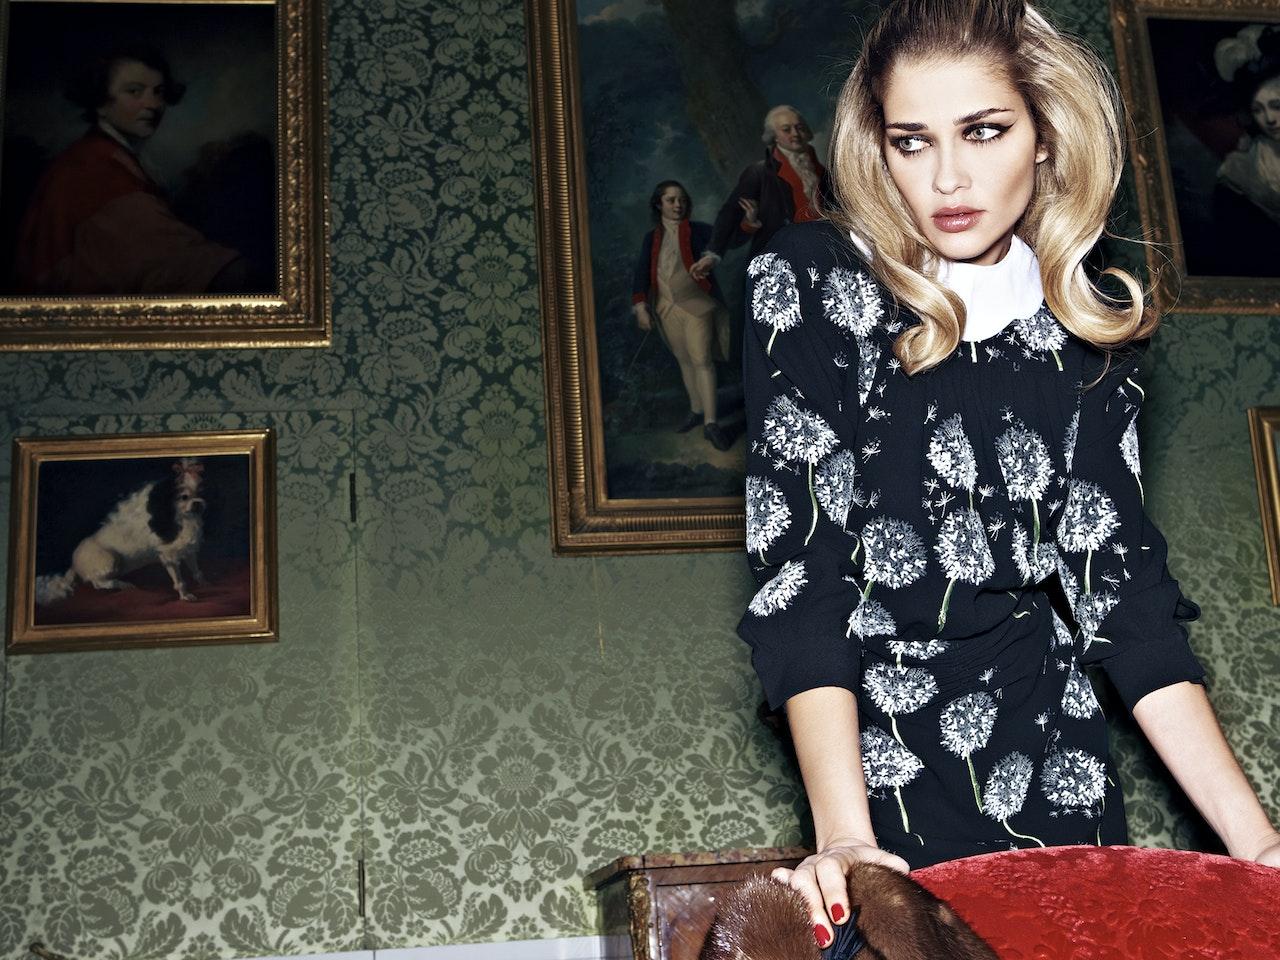 Fashion - Editorial  /  Photographer: Thomas Nützl  /  ELLE Russia